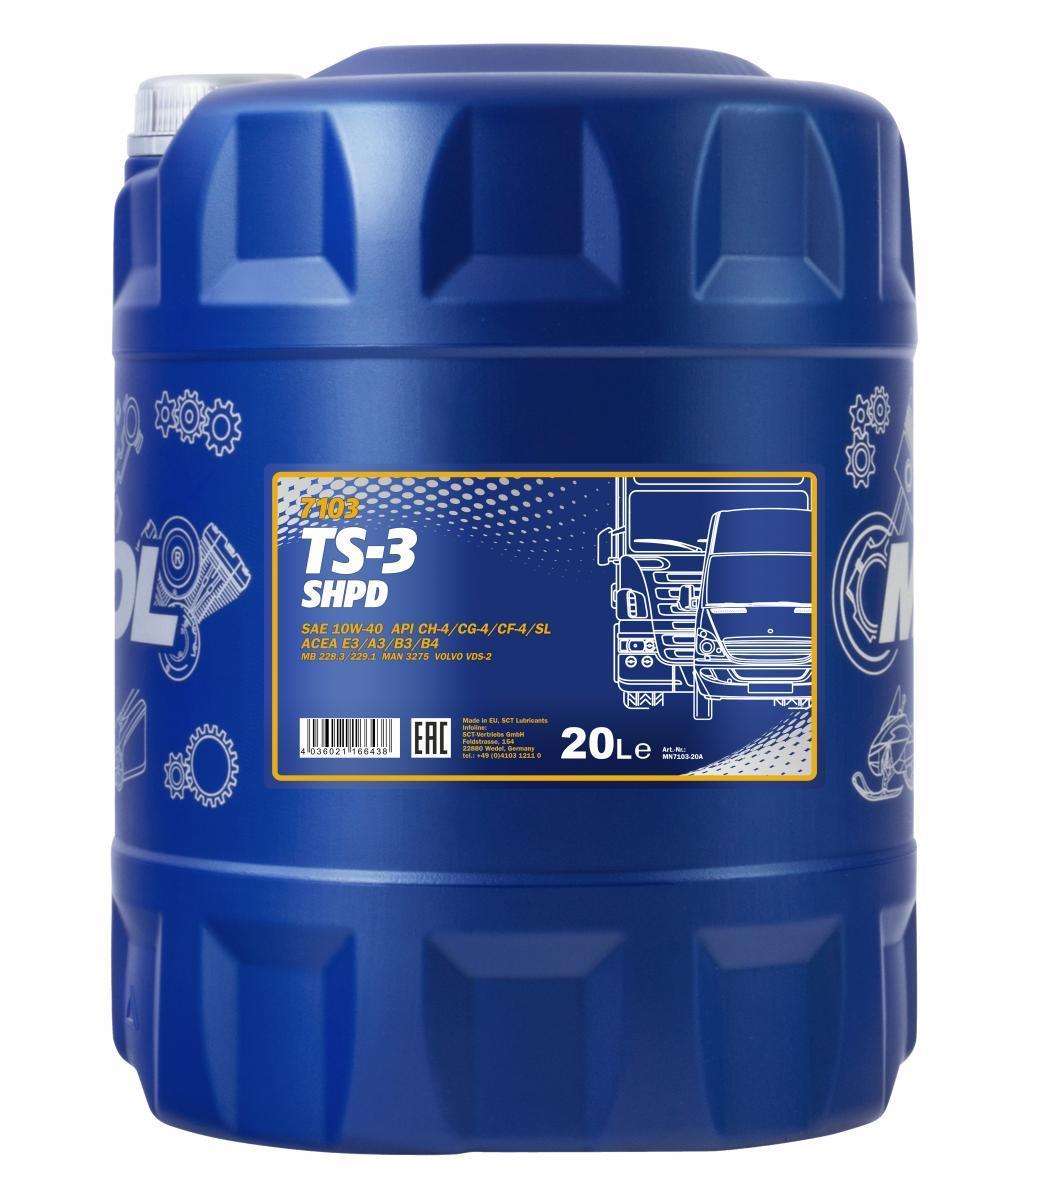 MN7103-20 MANNOL TS-3, SHPD 10W-40, 10W-40, 20l Motoröl MN7103-20 günstig kaufen